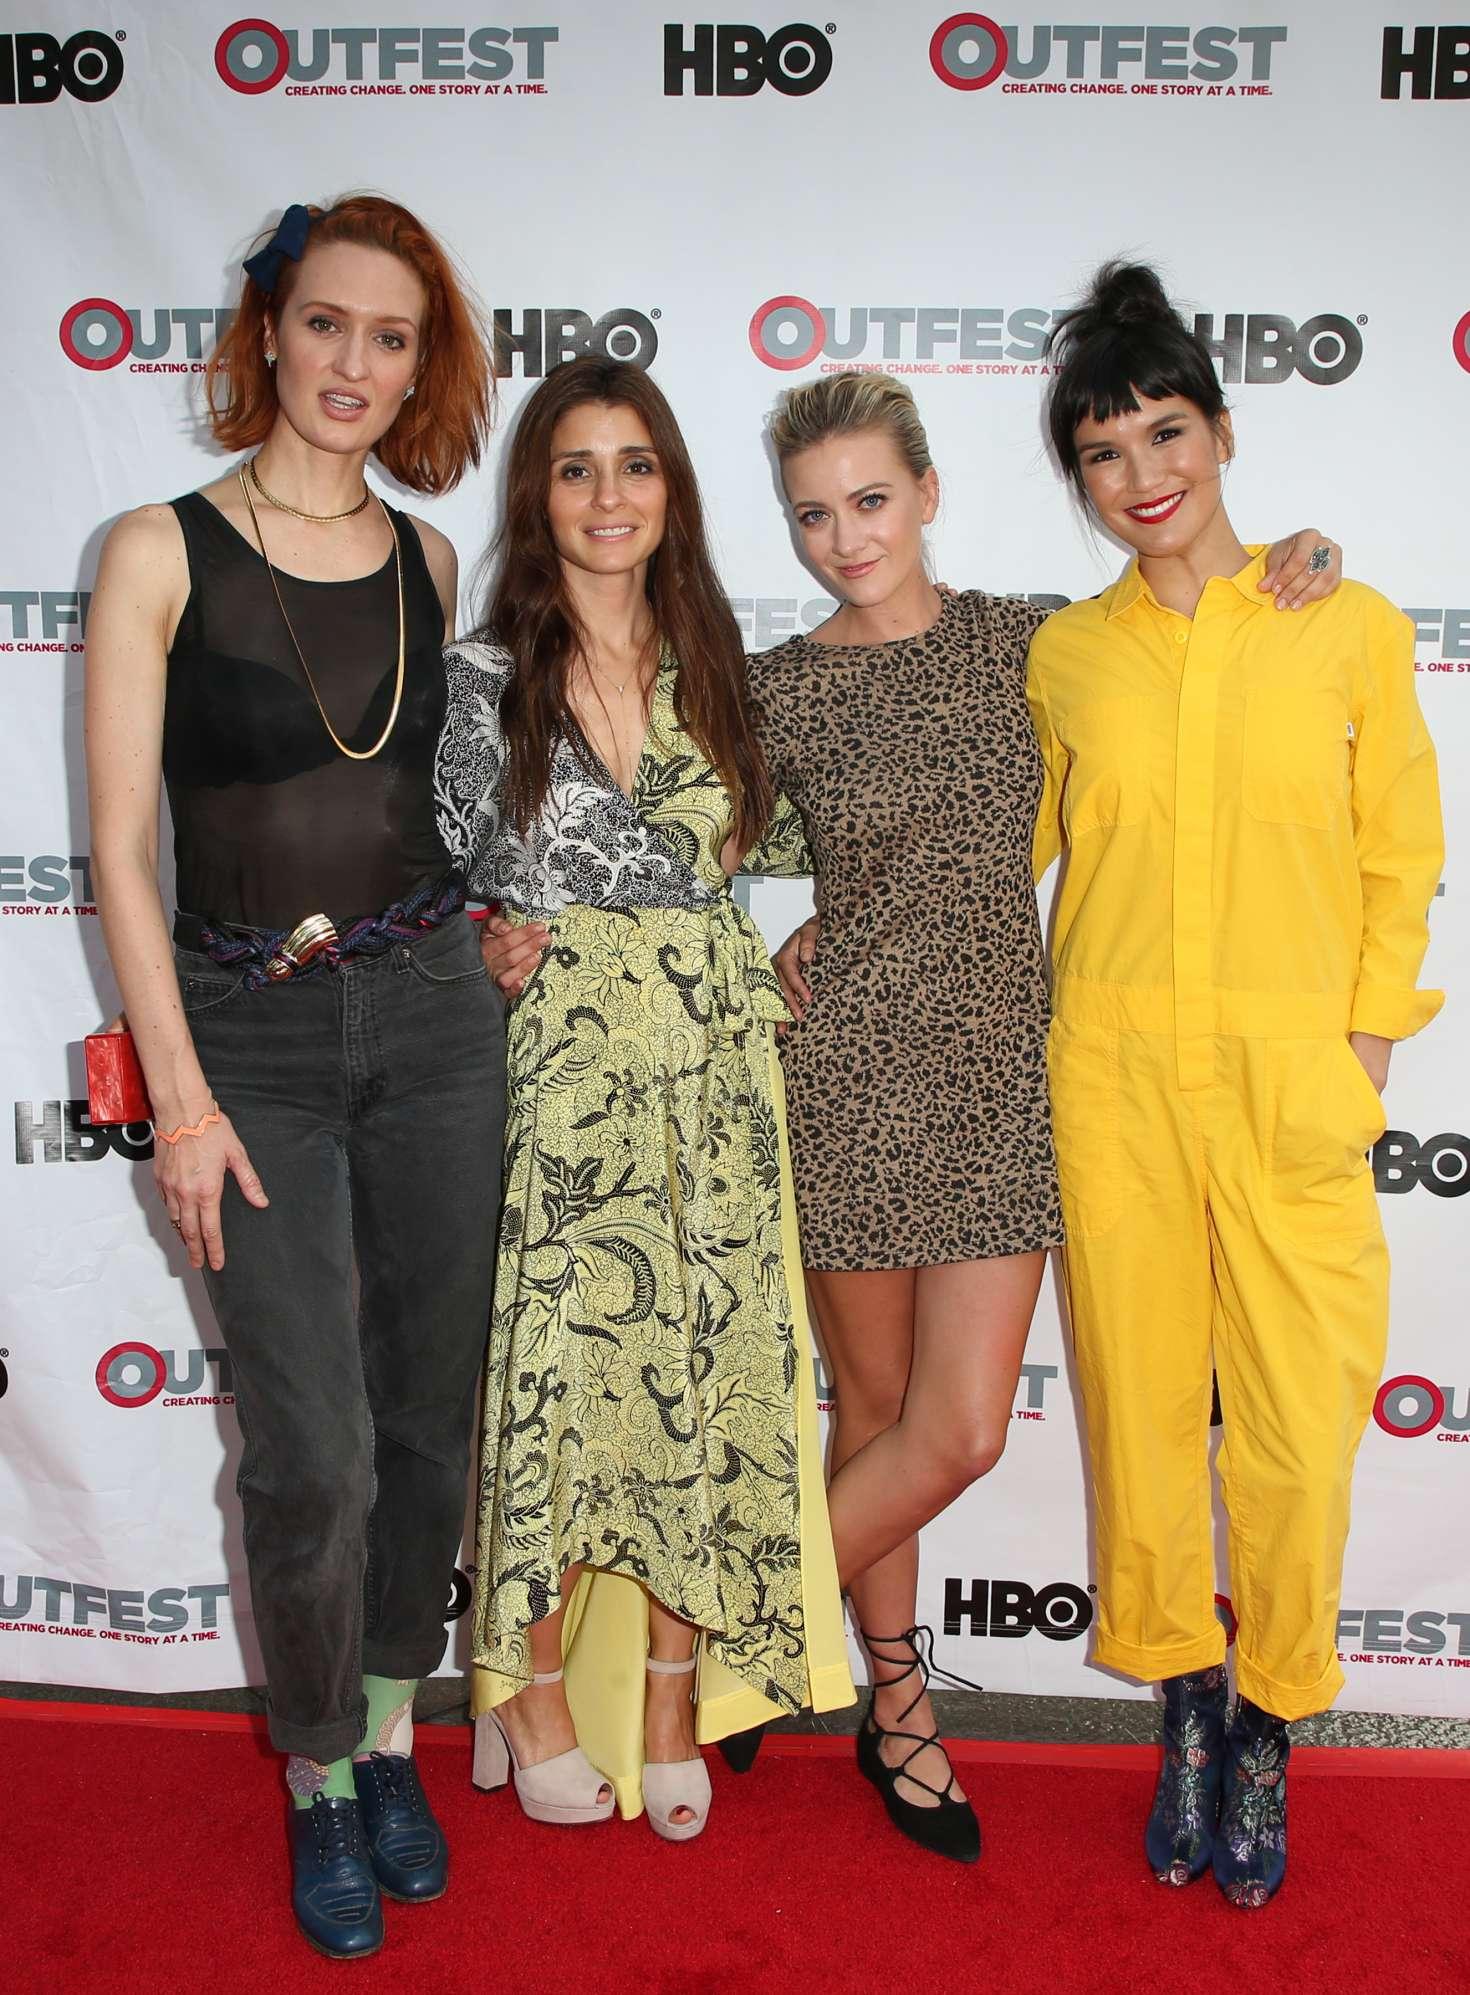 Shiri appleby strangers screening outfest los angeles lgbt film festival nude (26 photo), Boobs Celebrity photo